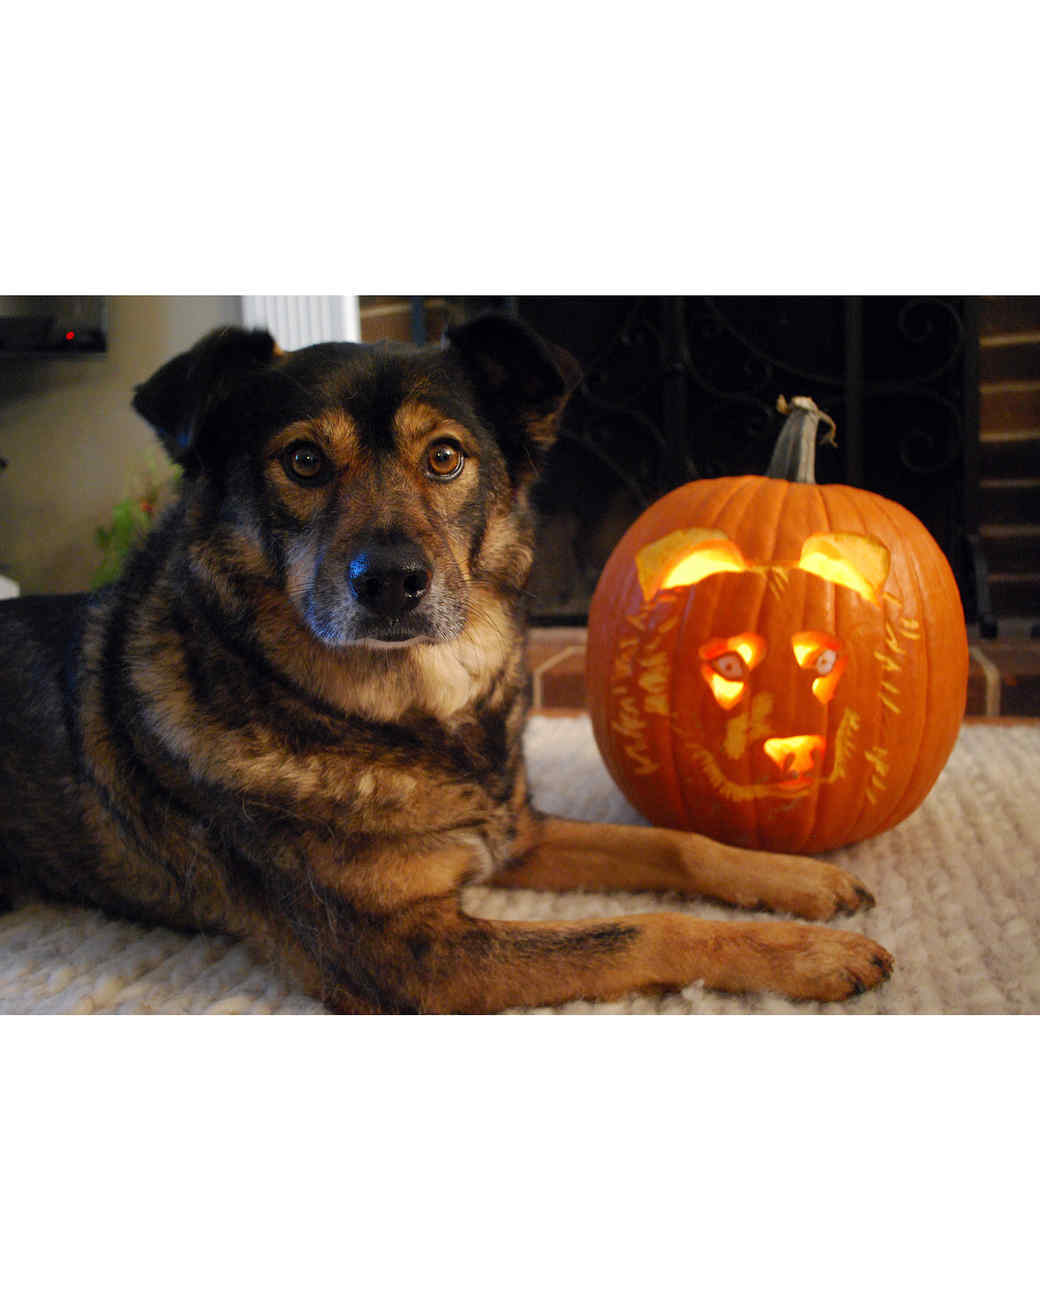 ugc-halloween-1011-leesea-14942520.jpg